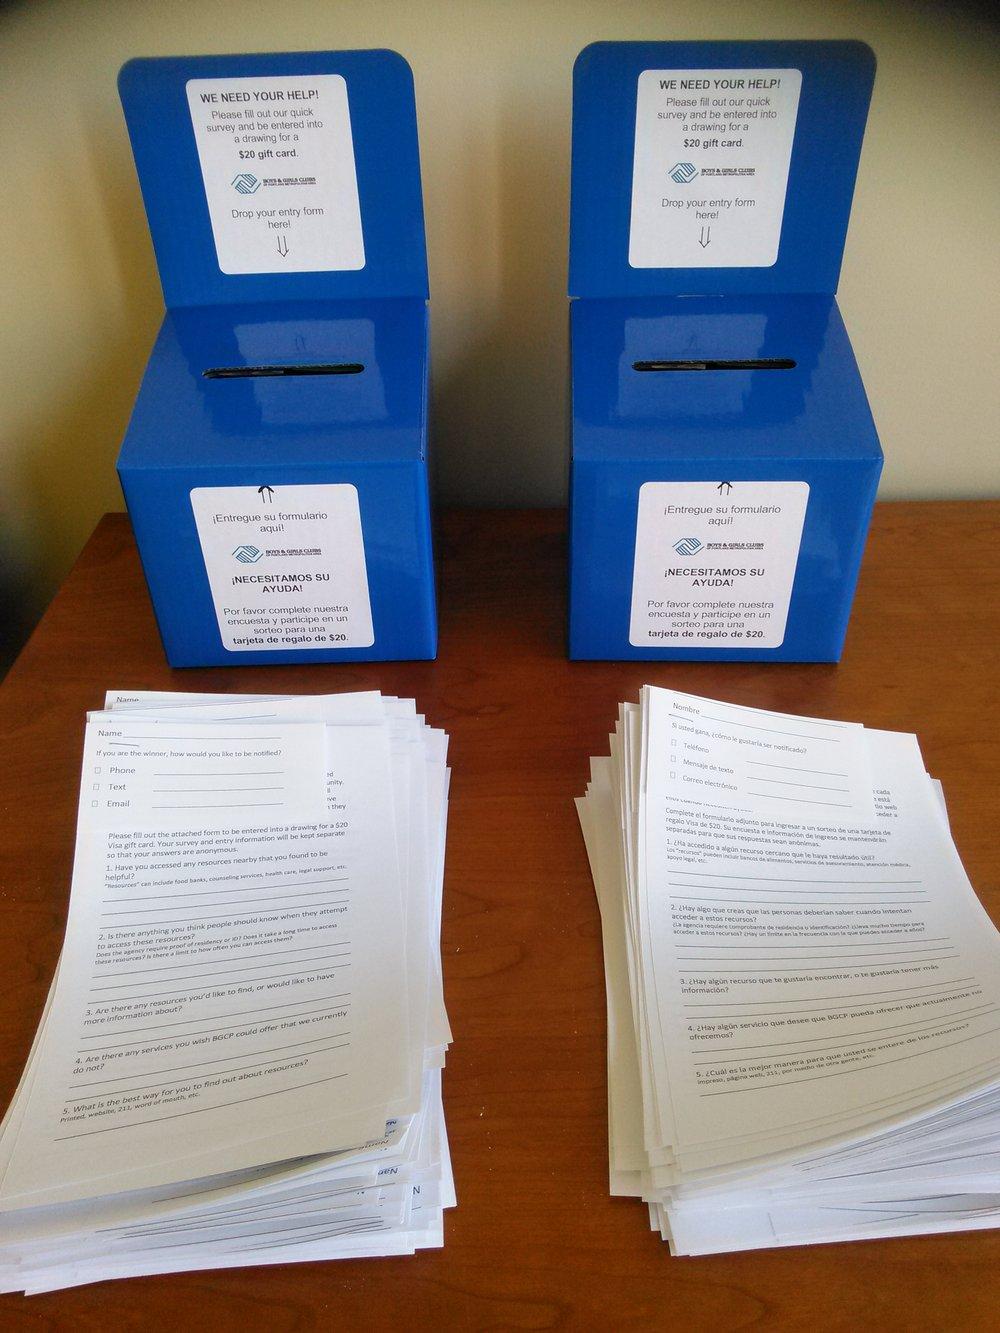 Survey materials for community needs assessment.